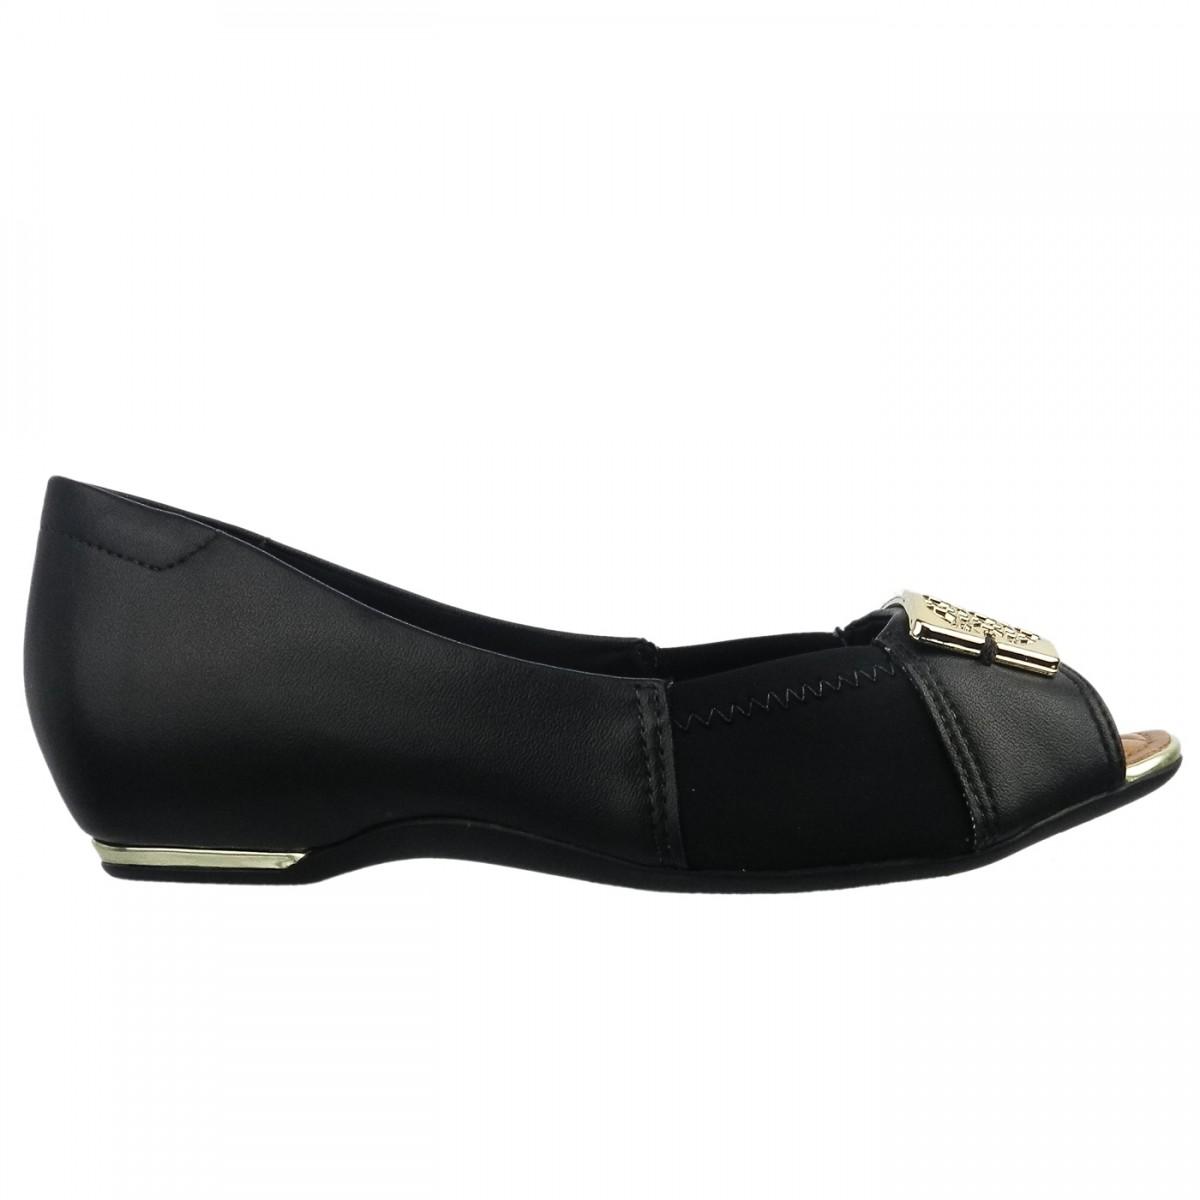 cc5b4eab86 Bizz Store - Sapatilha Peep Toe Feminina Comfortflex Neoprene